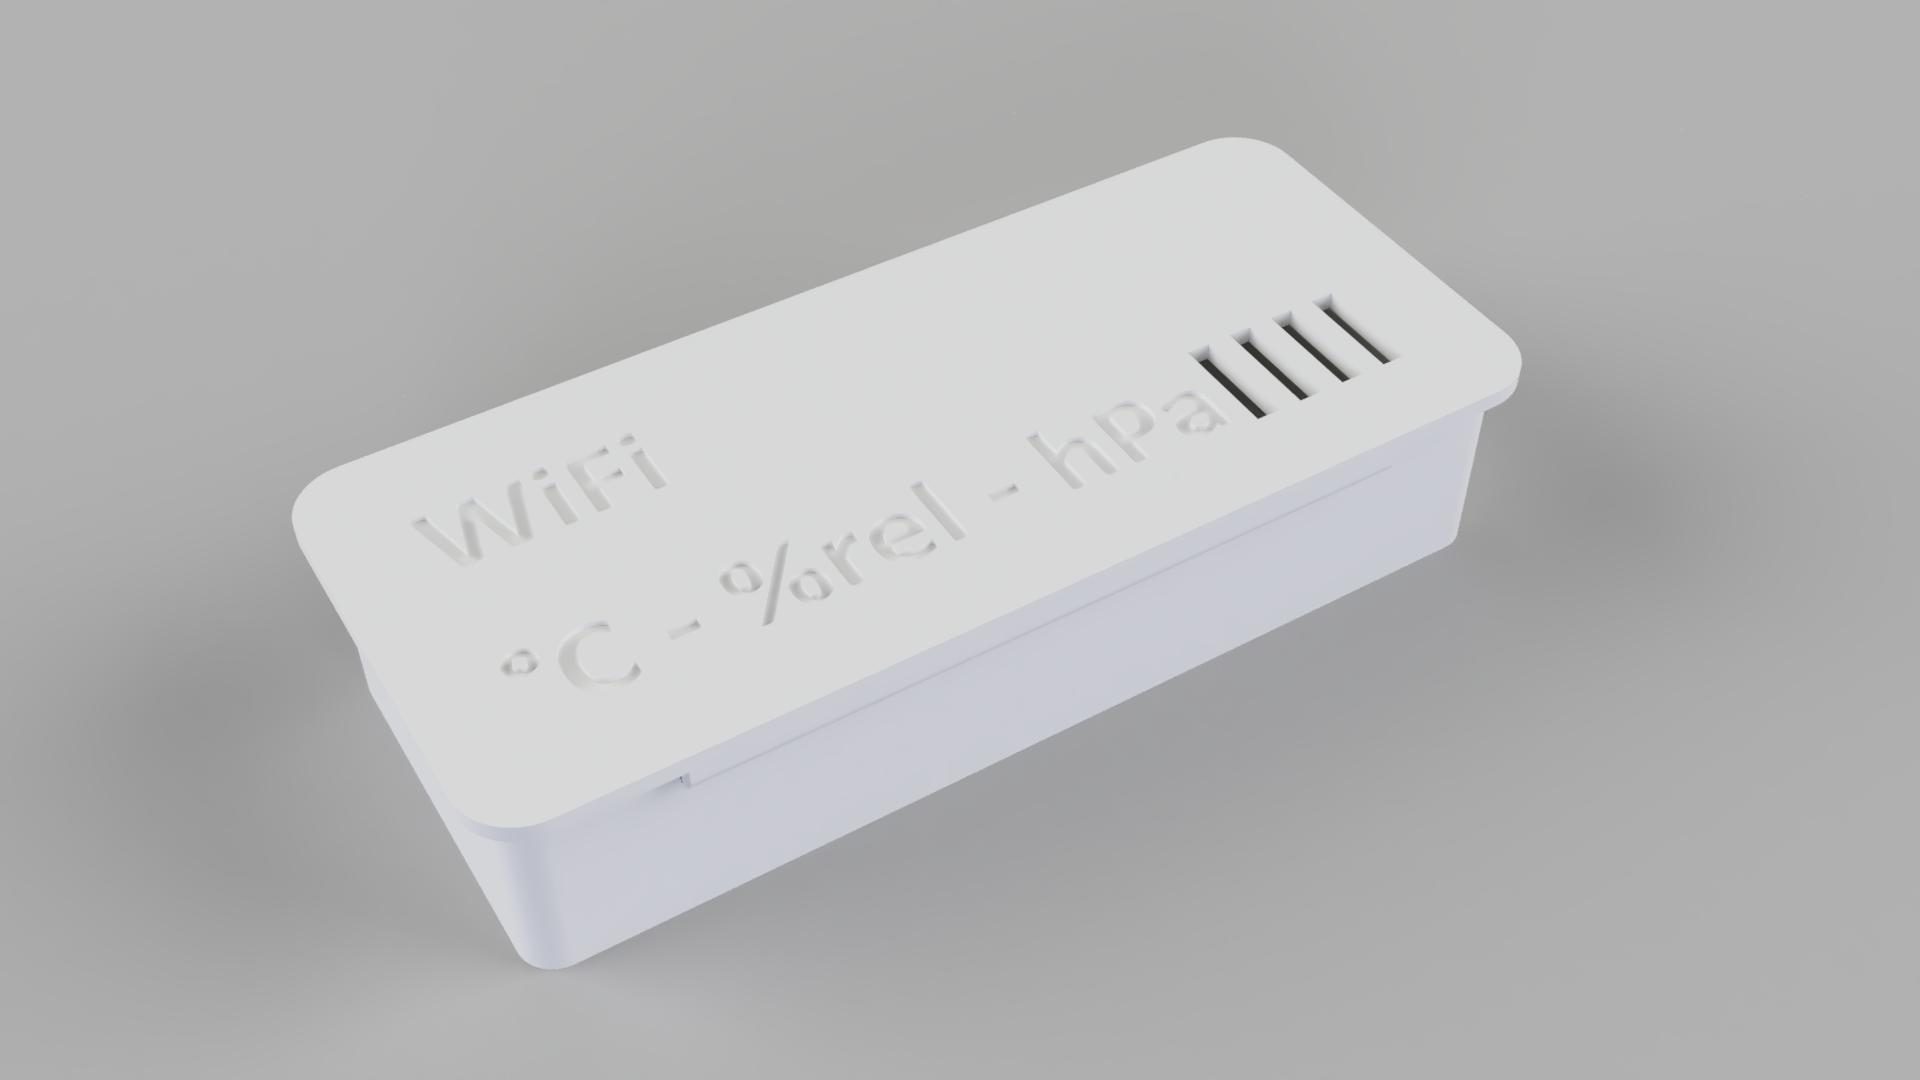 ESP8266 Multi Sensor BME280 (battery powerd) - T, Humidity